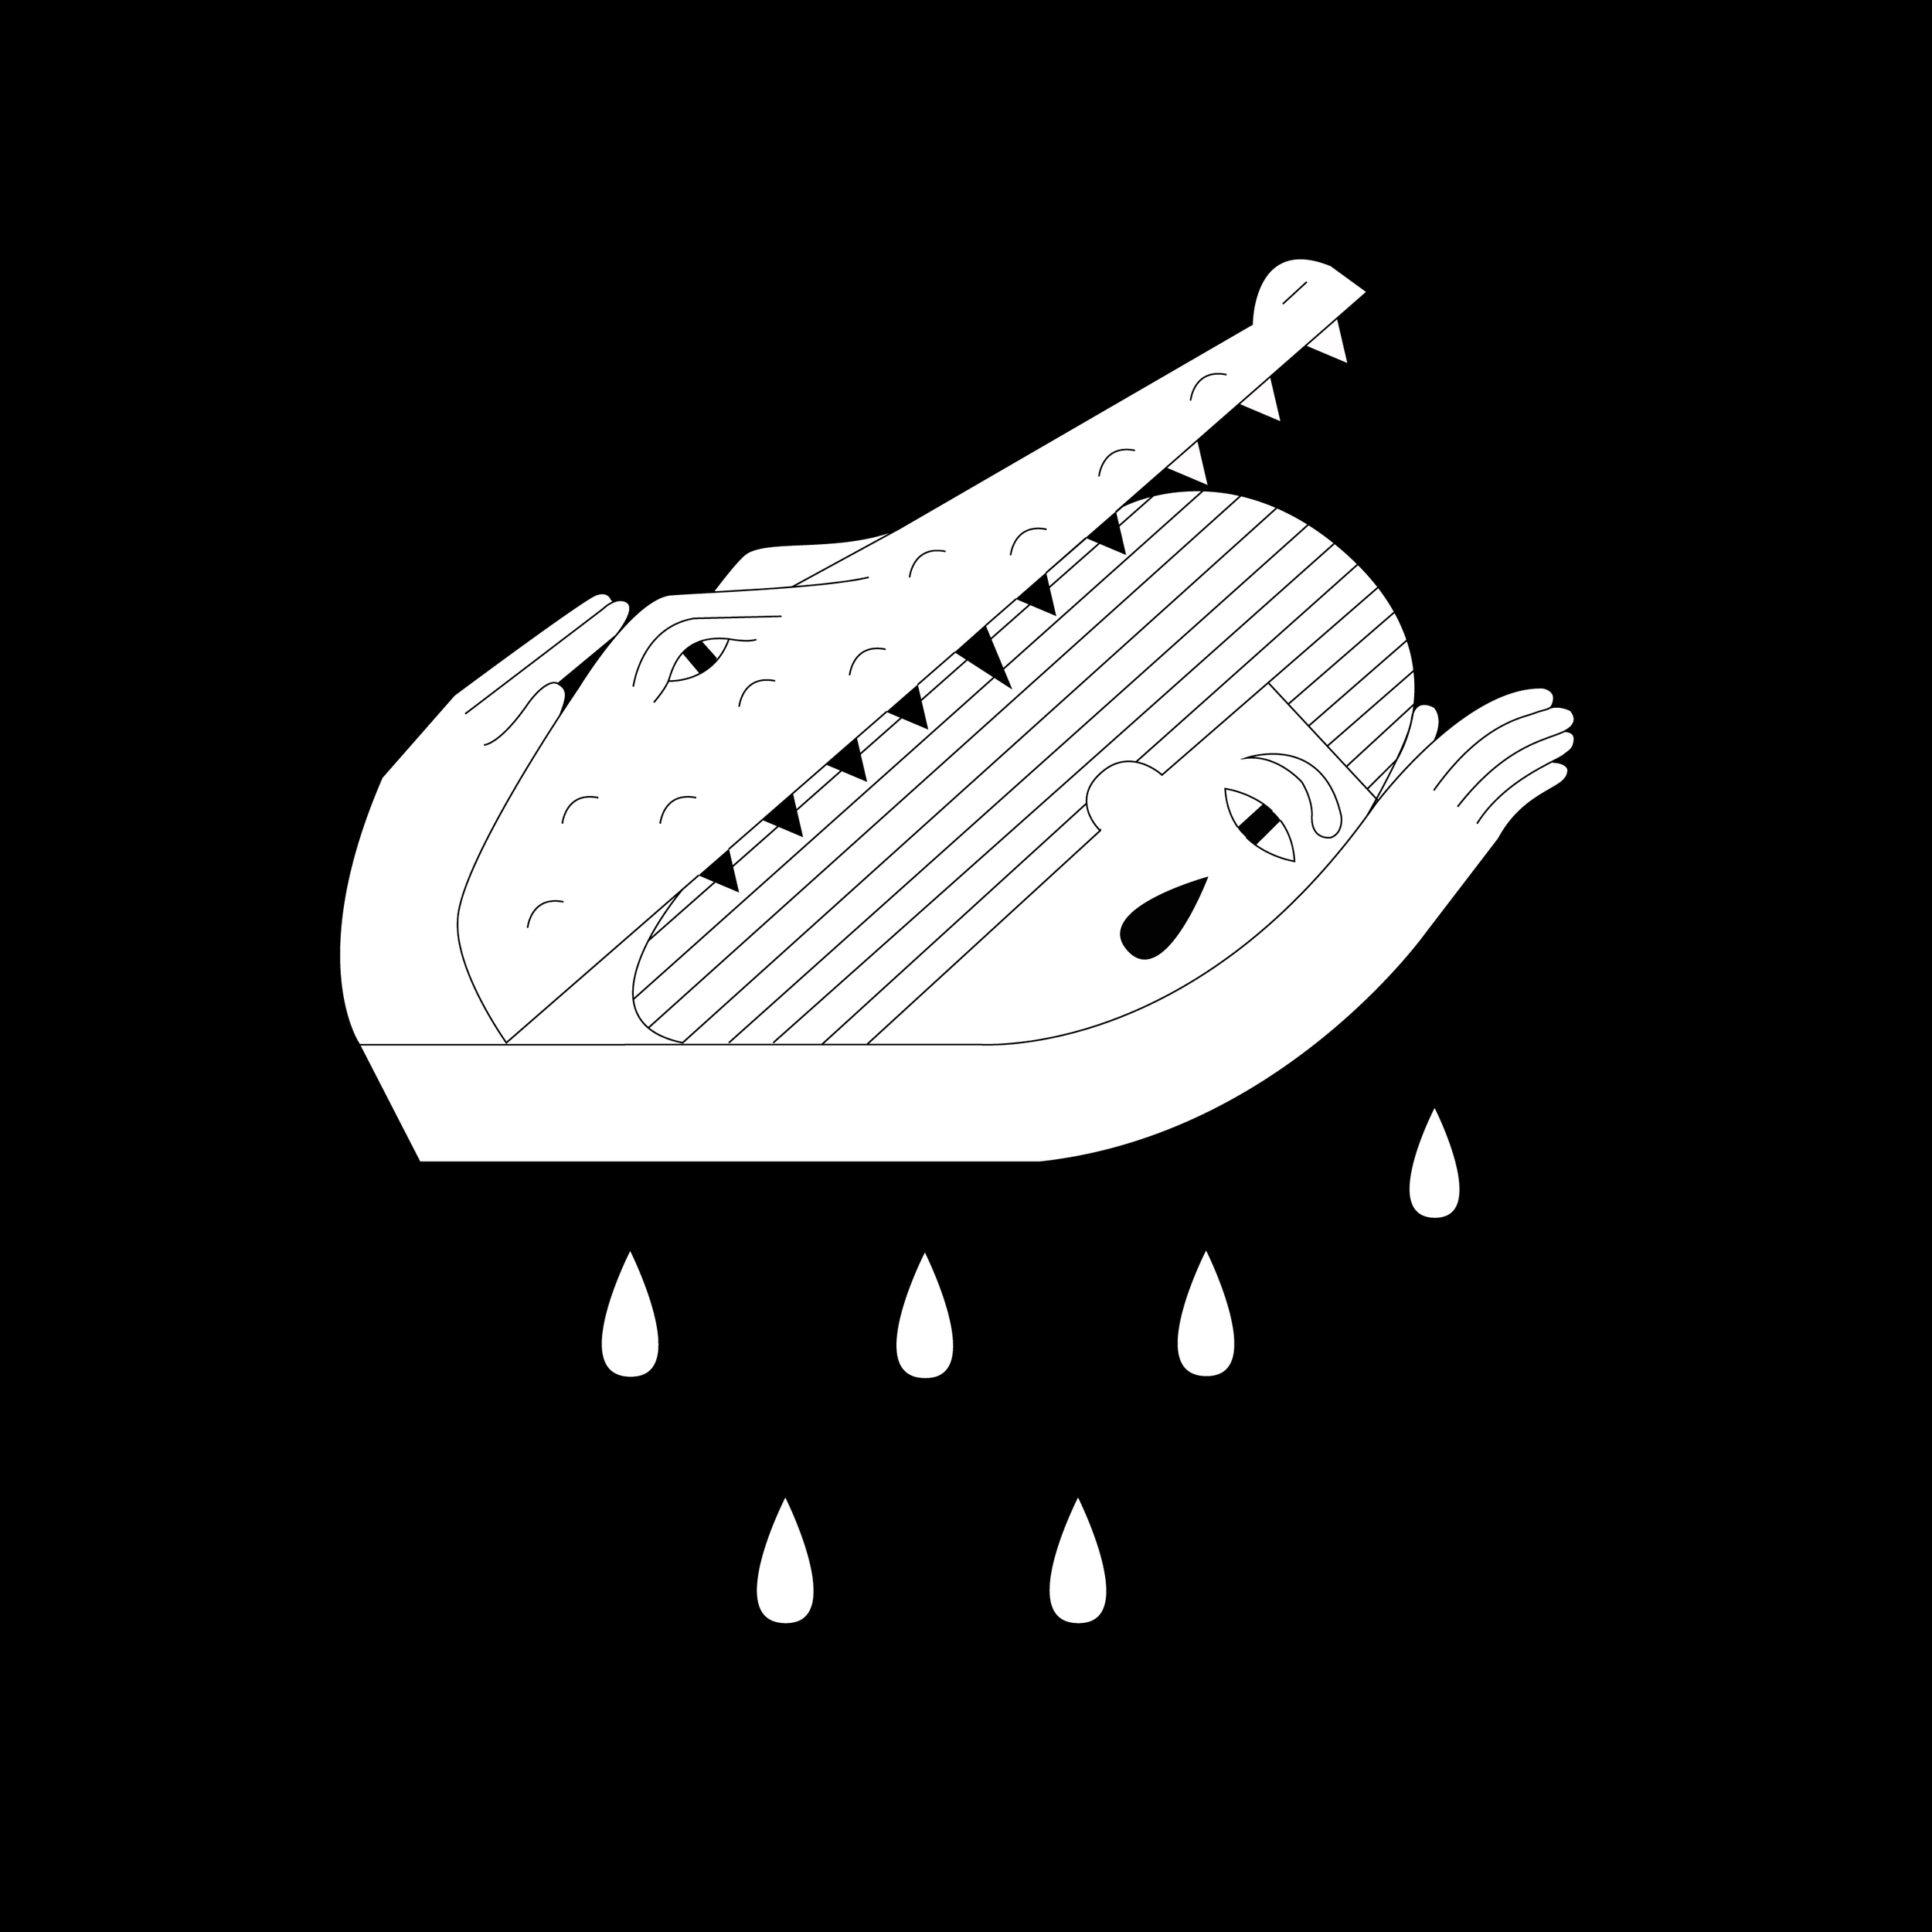 crocodile-tears.jpg